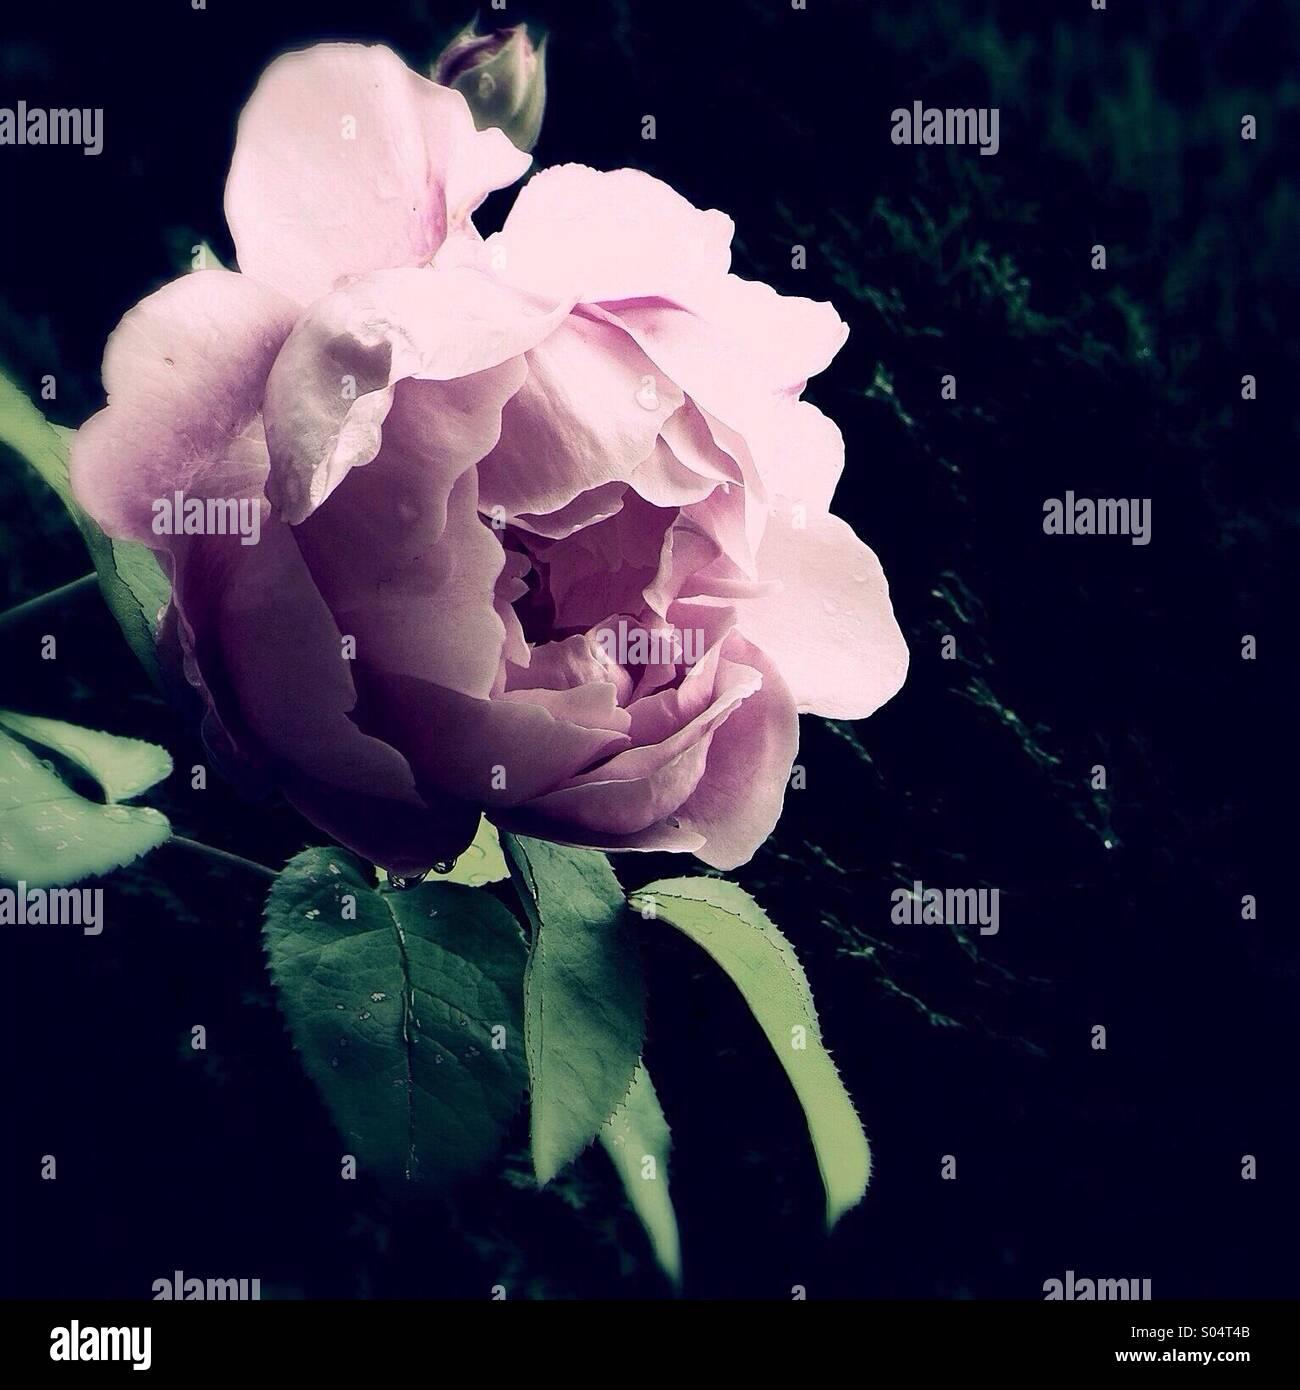 Midnight Rose - Stock Image